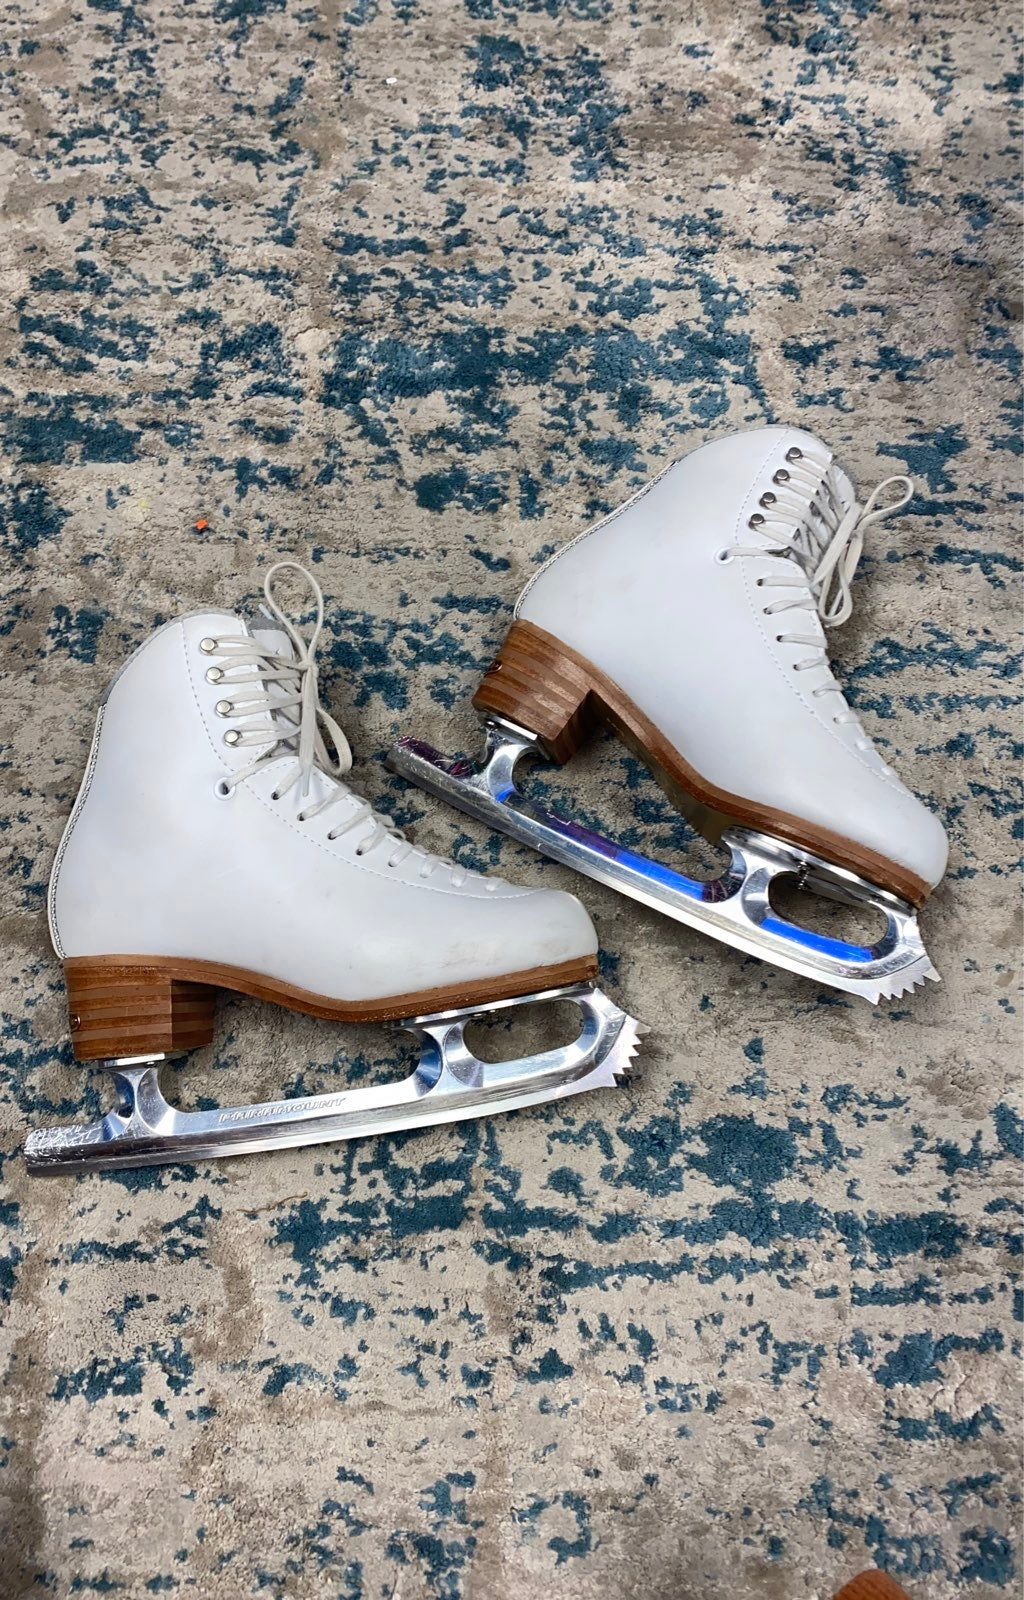 5.5 Jackson Debut ice figure skates